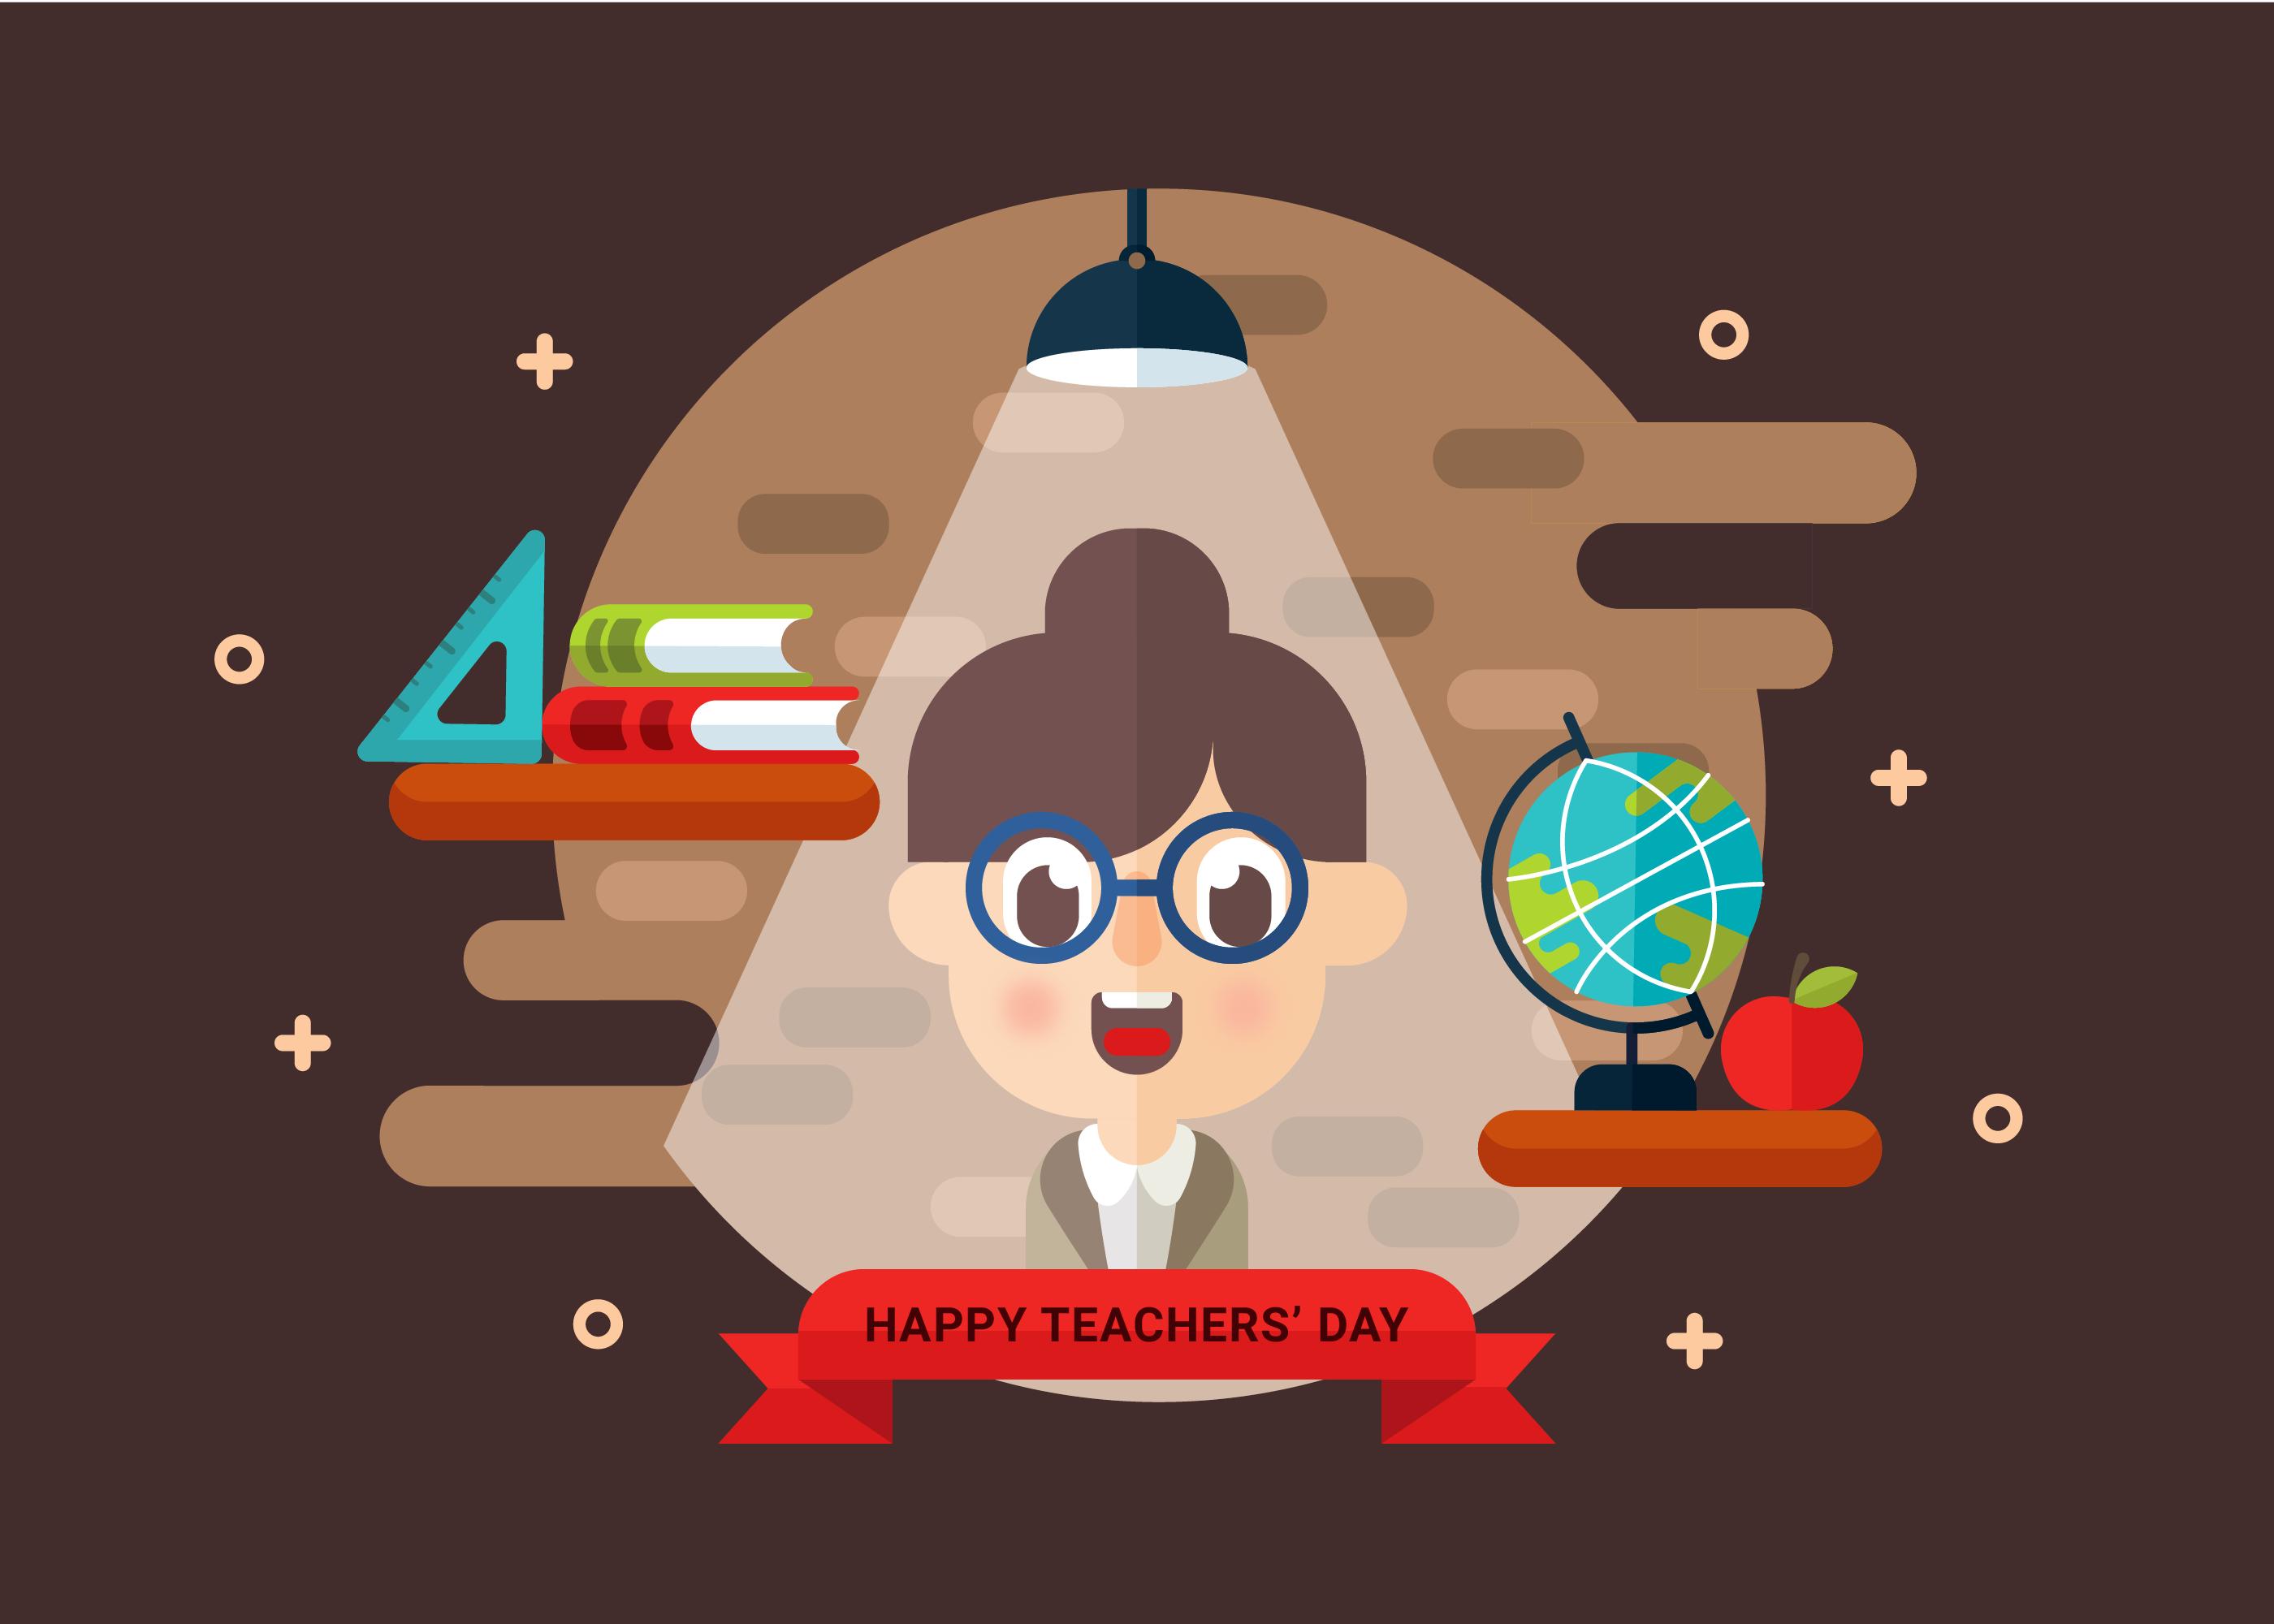 Teachers Day Vector Download Free Vector Art Stock Graphics Images